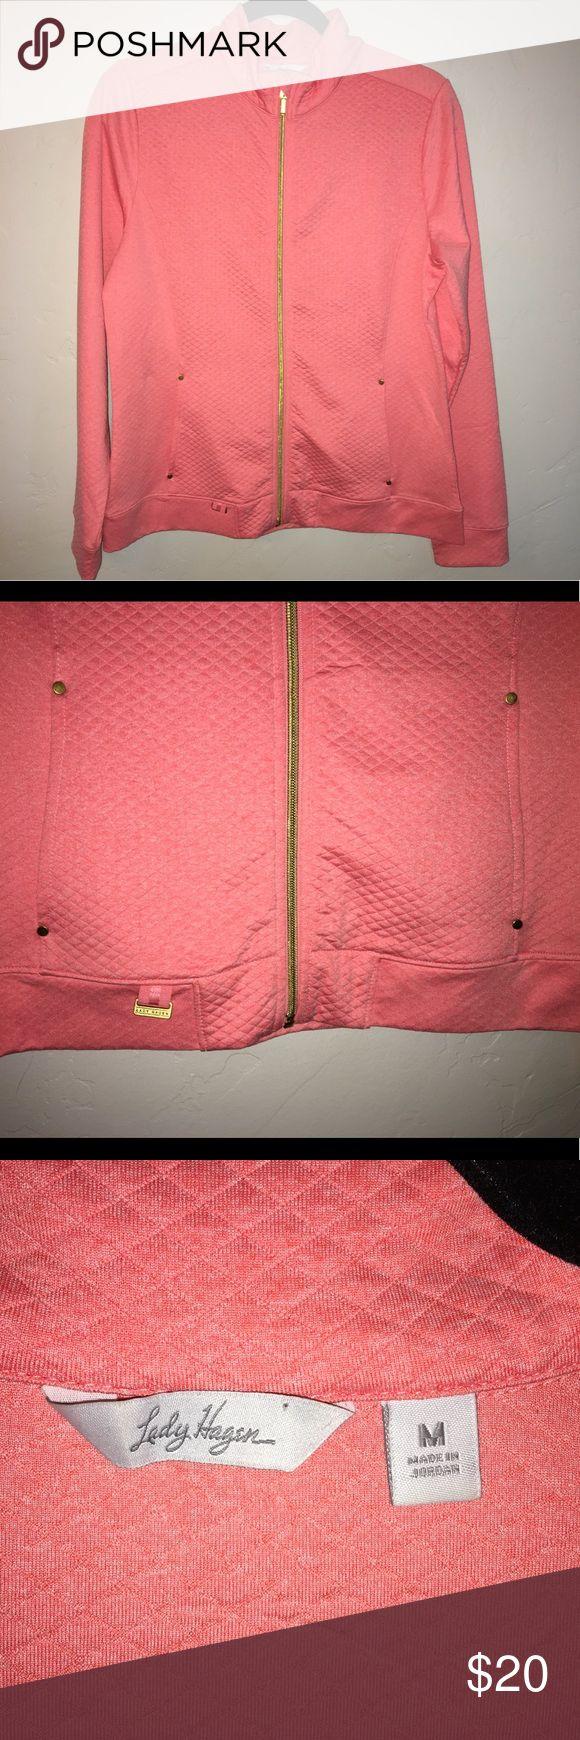 Lady Hagen Pink Running Jacket Size Medium EUC lady hagen Jackets & Coats